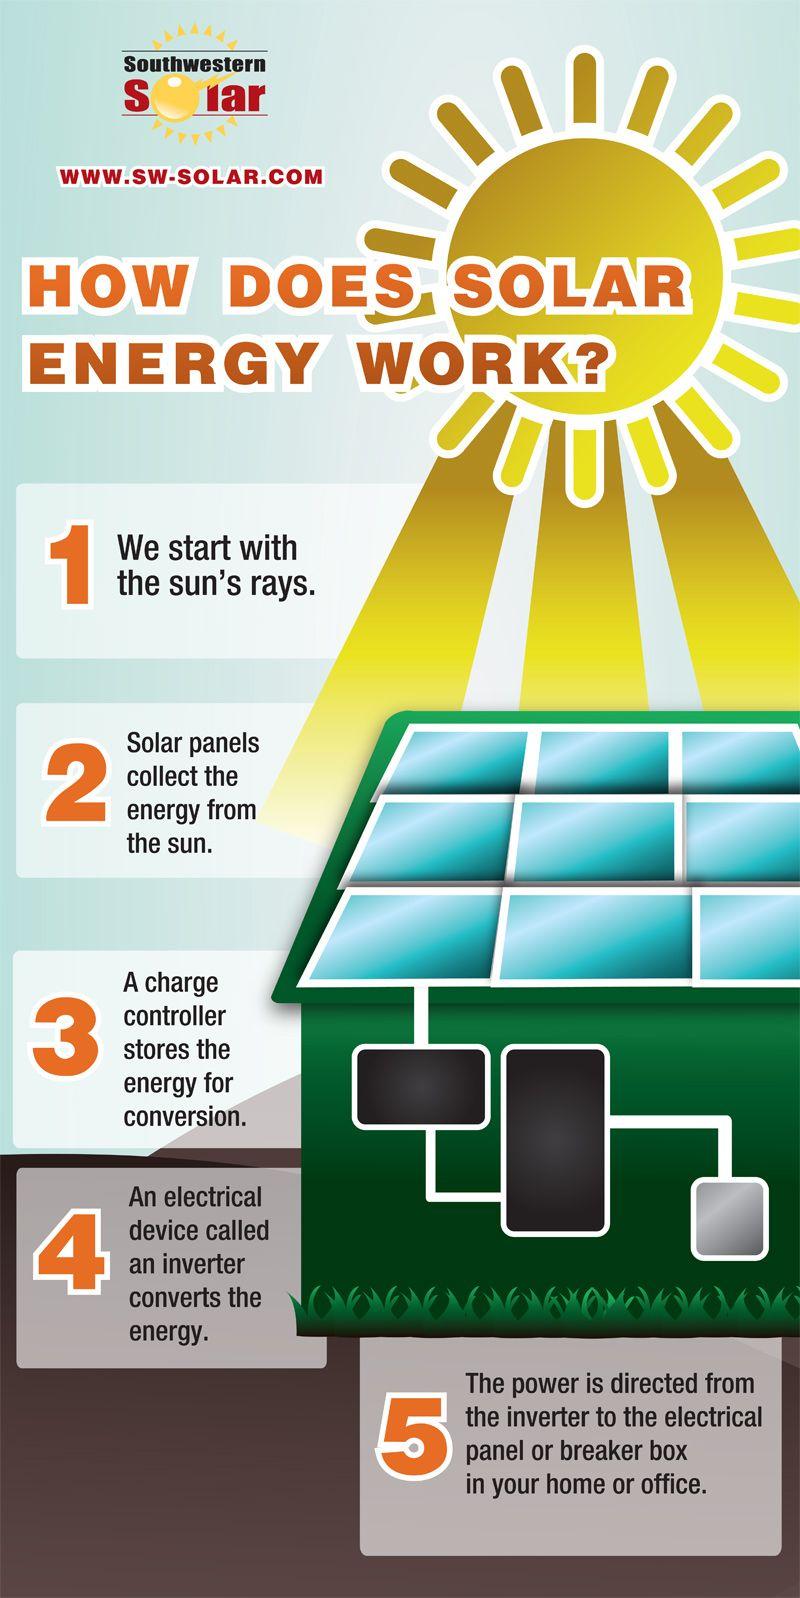 How Solar Energy Works how does solar energy work infographic | solar energy | pinterest